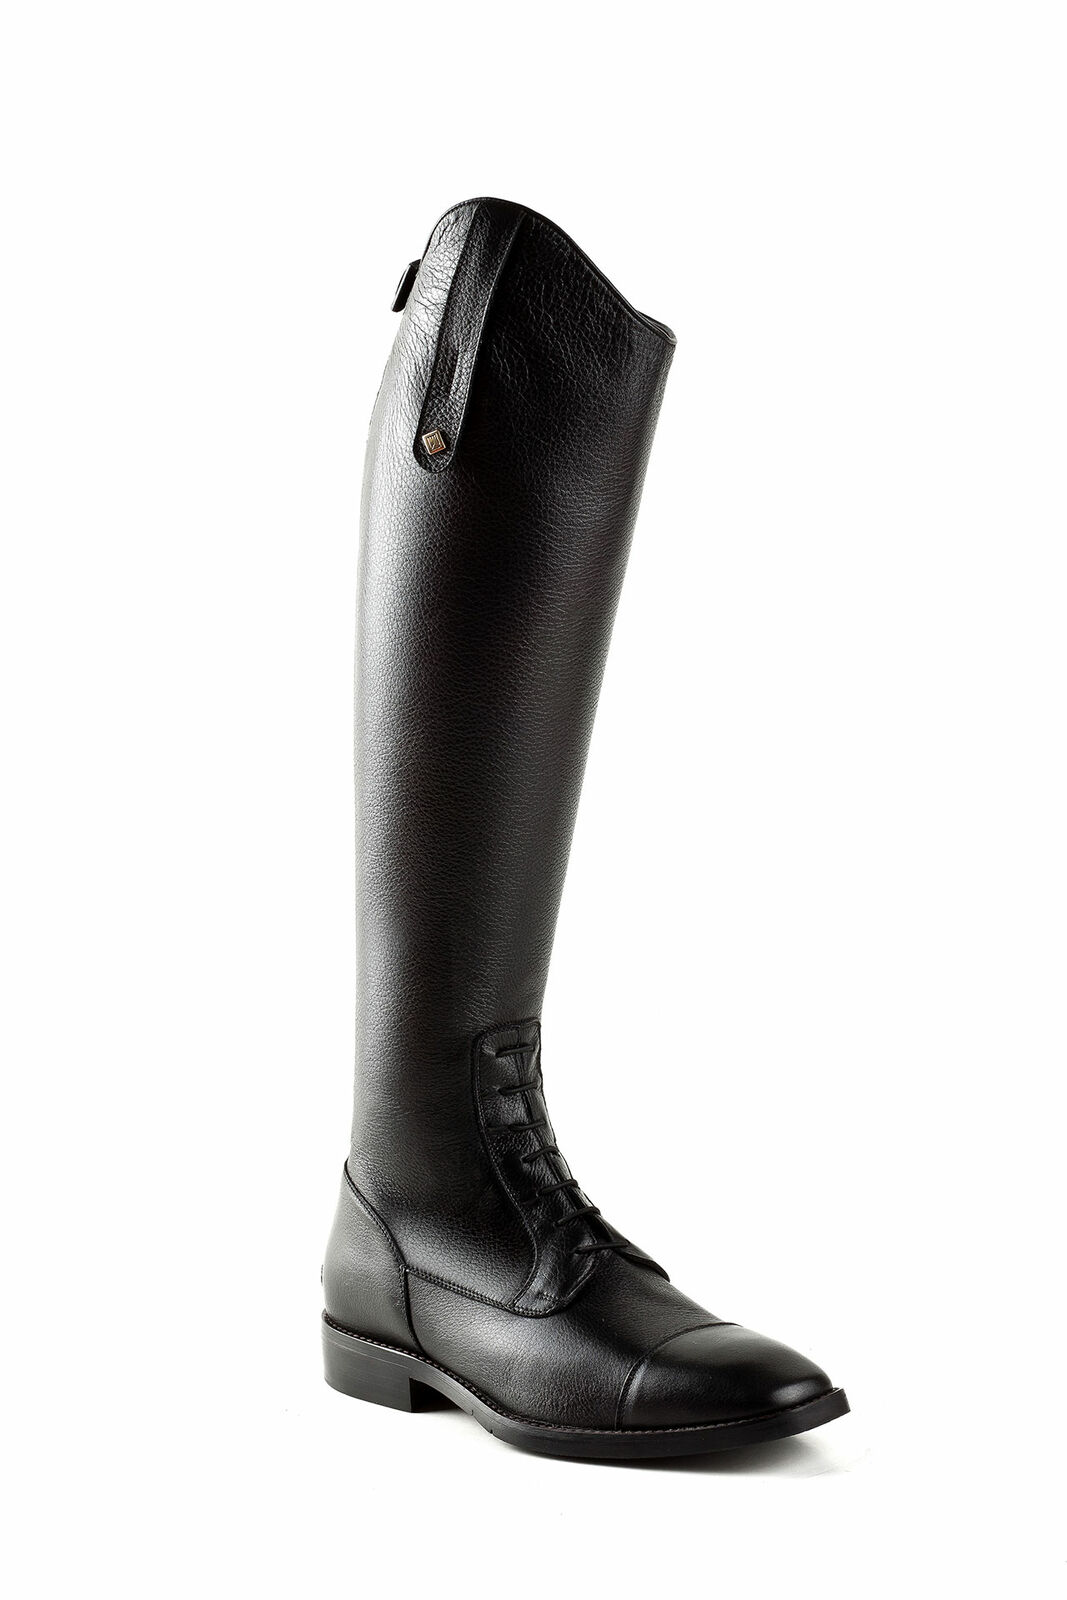 DeNiro S3312 botas  MC 37 negro XXS saltar botas soft quick  venta con descuento